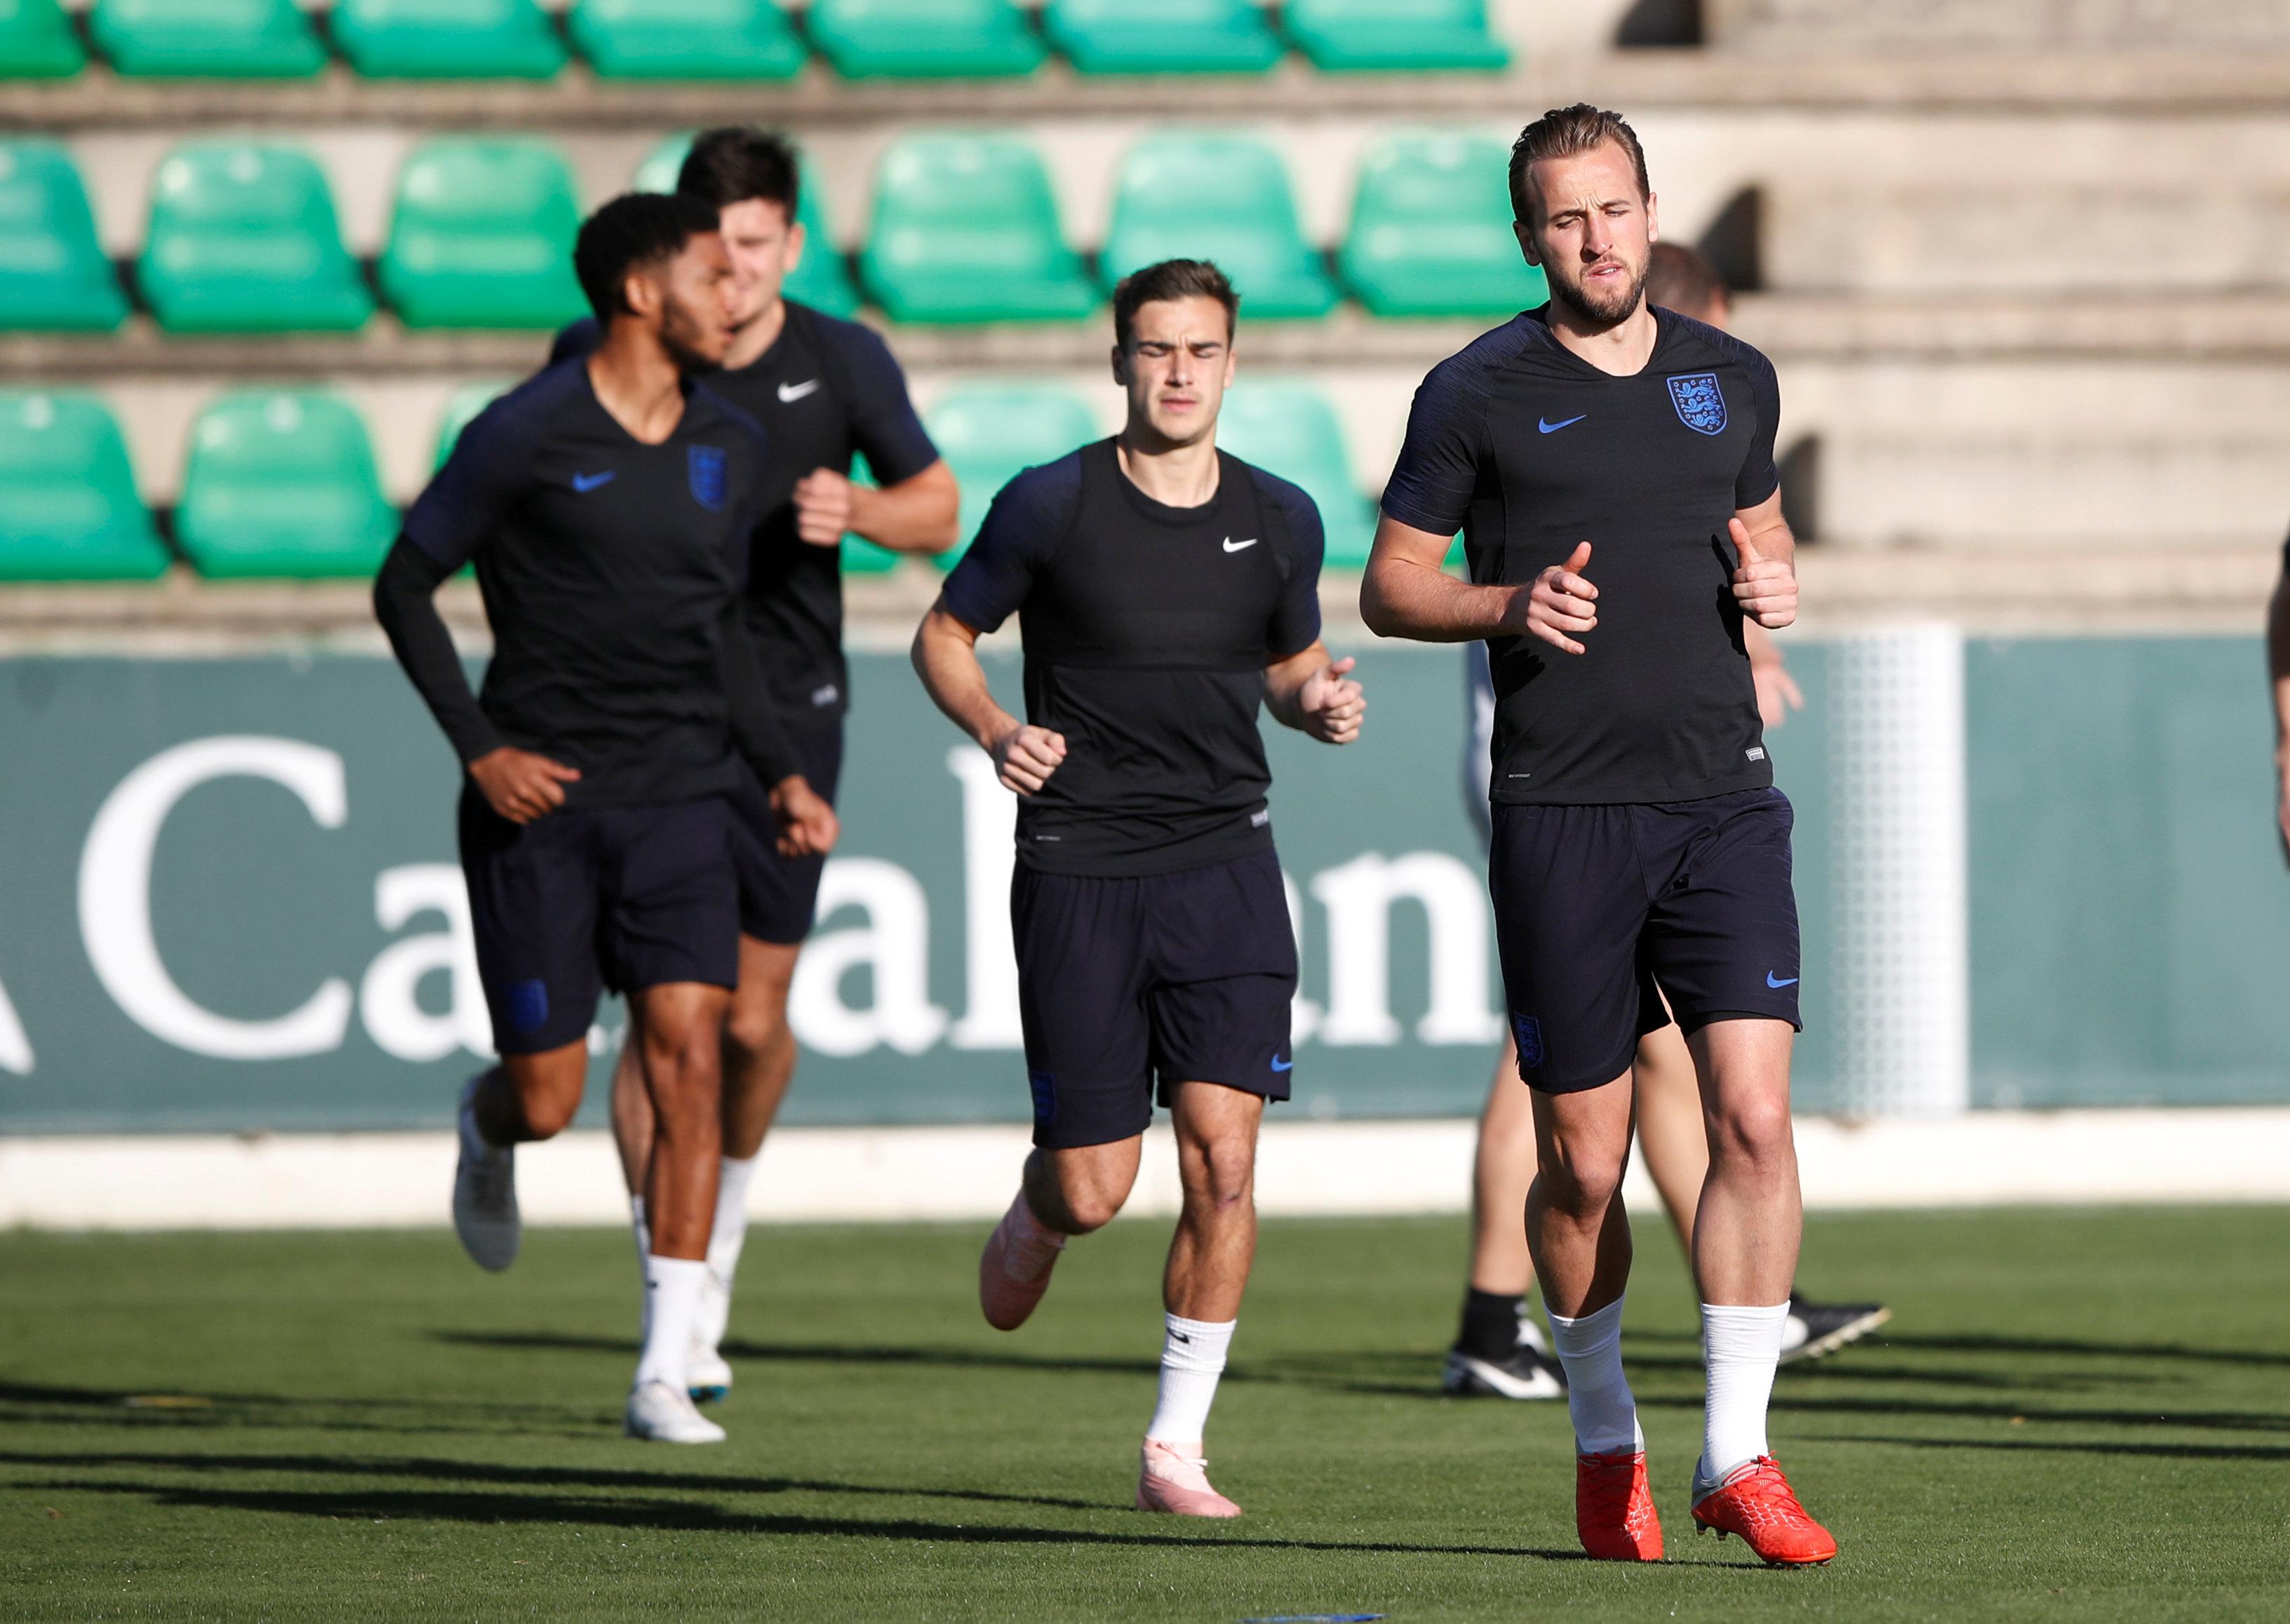 Football: Spain are above England's level, says goal-shy Kane